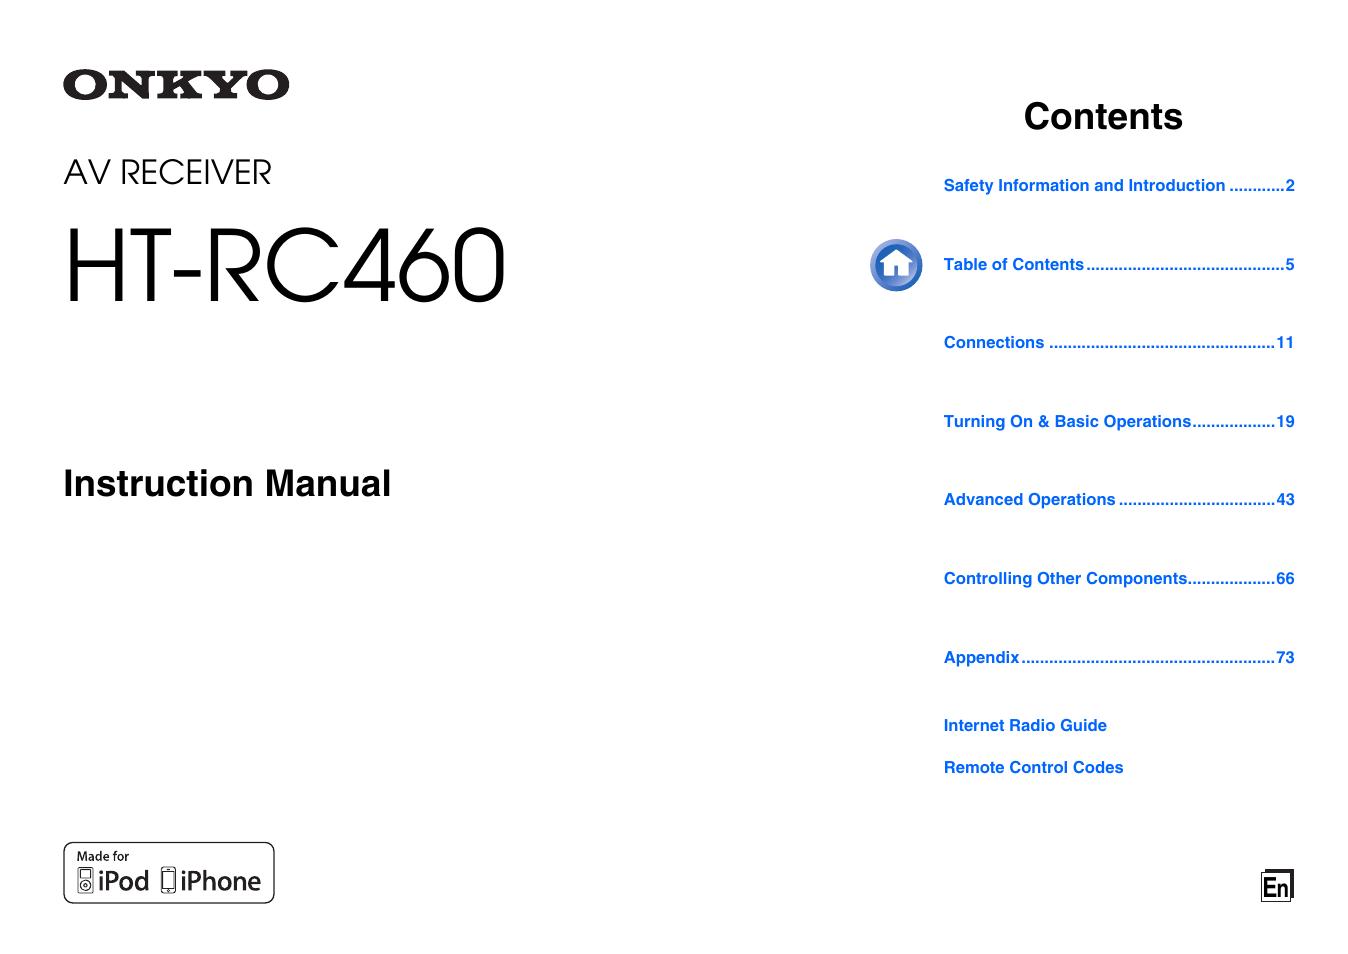 onkyo av receiver ht rc460 user manual 140 pages rh manualsdir com Old Onkyo Receivers Onkyo HT R340 Service Manual